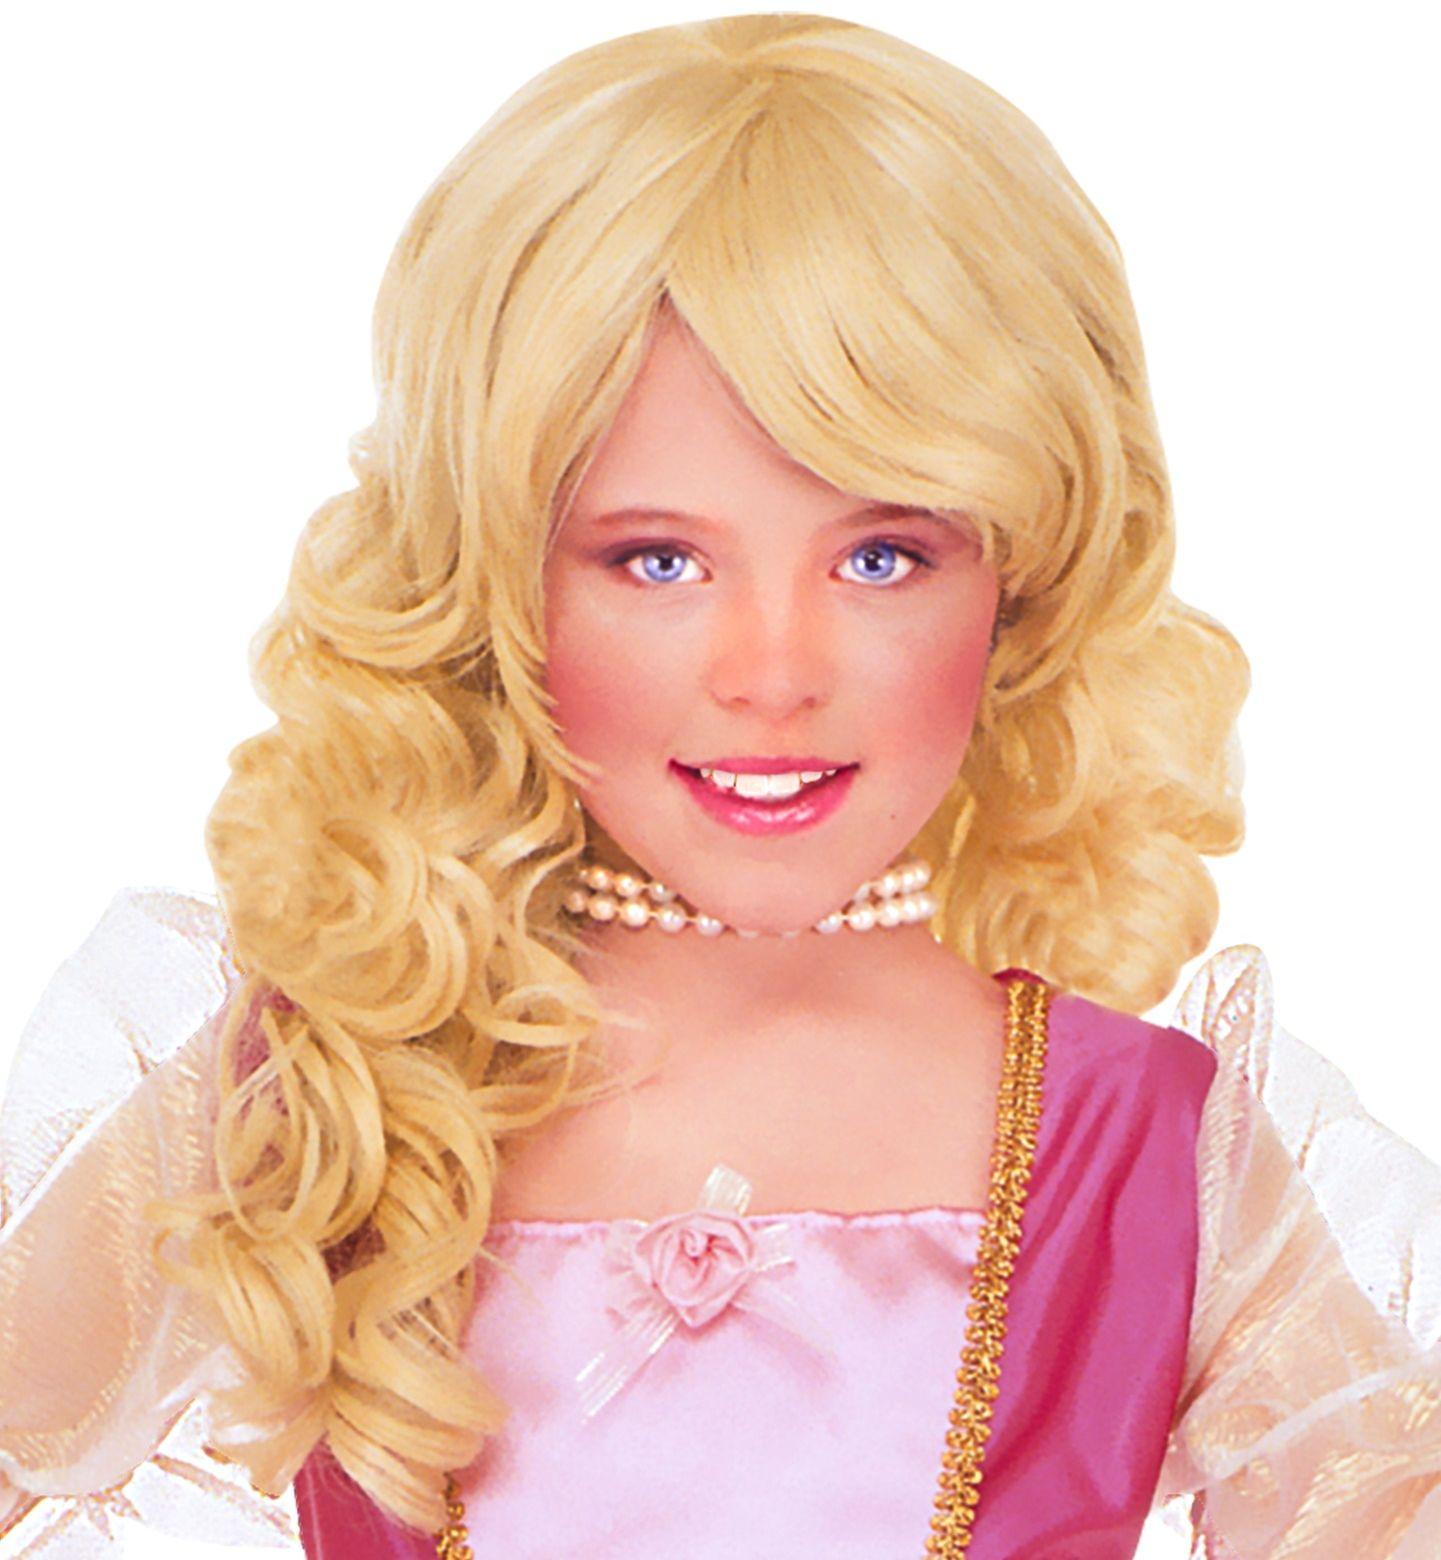 Blonde glamour pruik met krullen kind